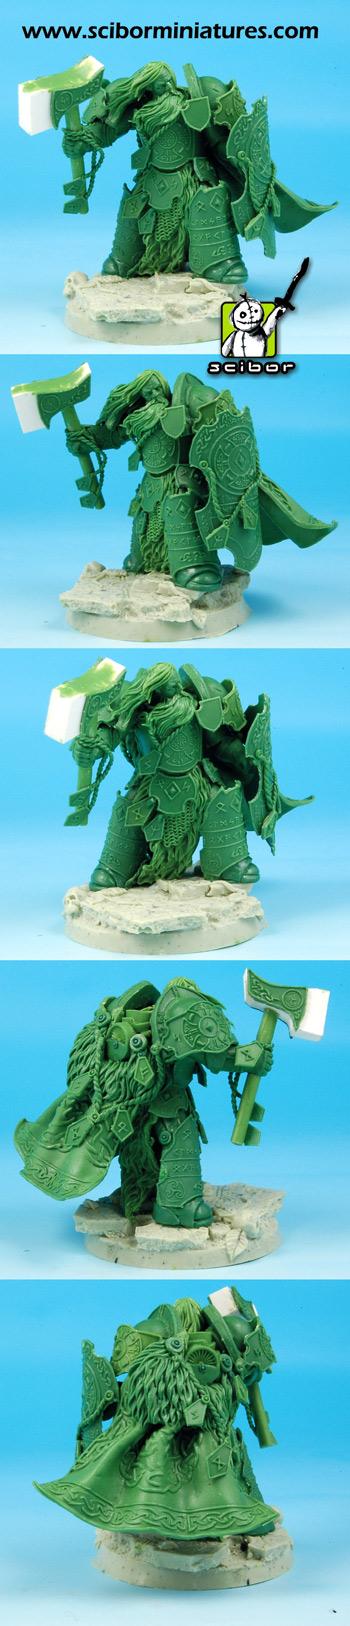 Science Fiction Celtic Warrior Greenstuff Sculpture